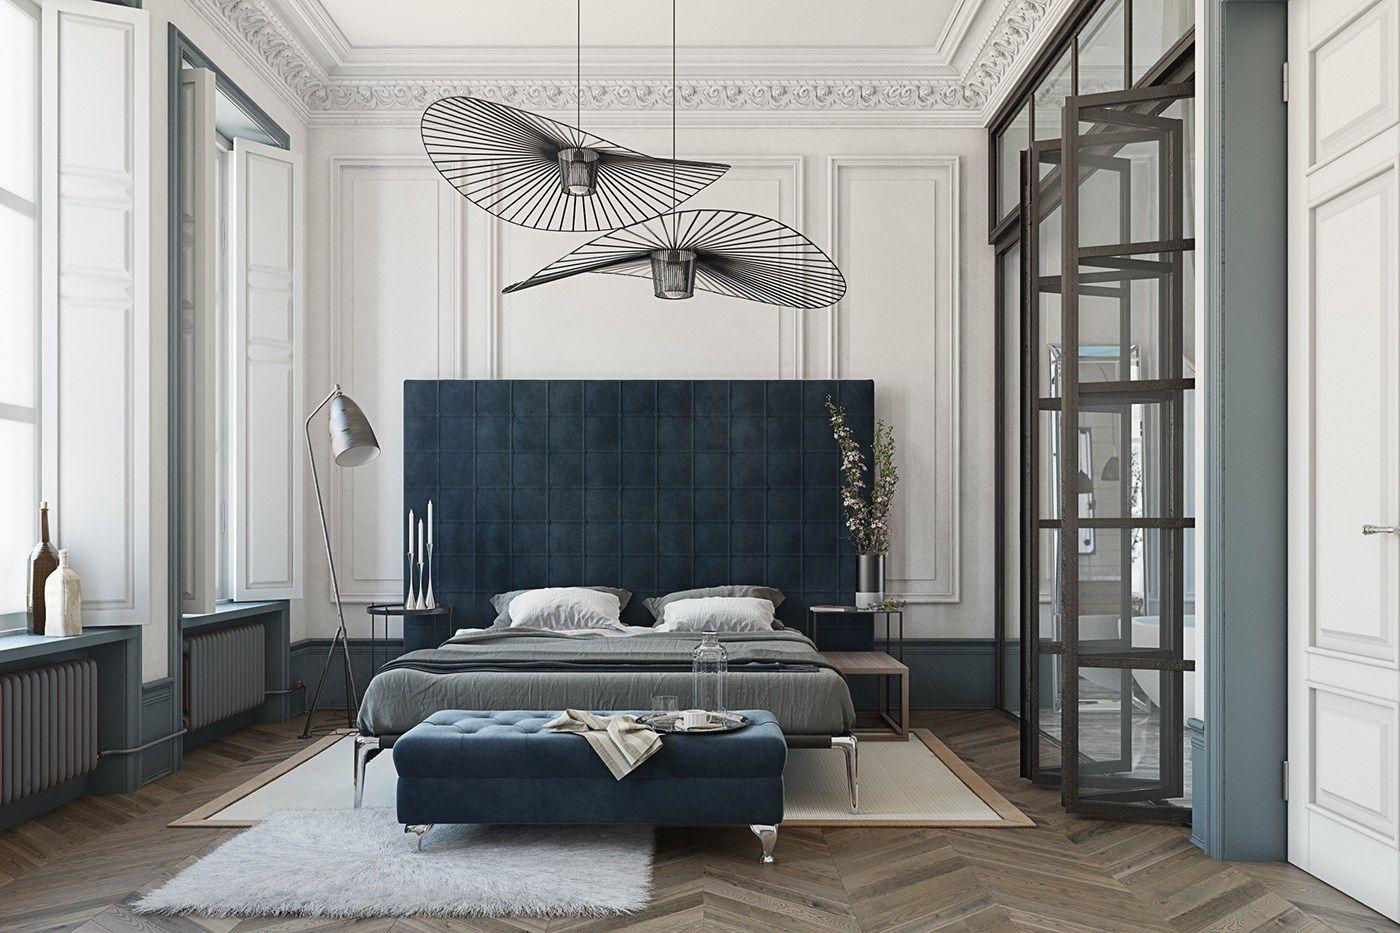 Best 8 Striking Bedrooms With Distinct Personalities 400 x 300